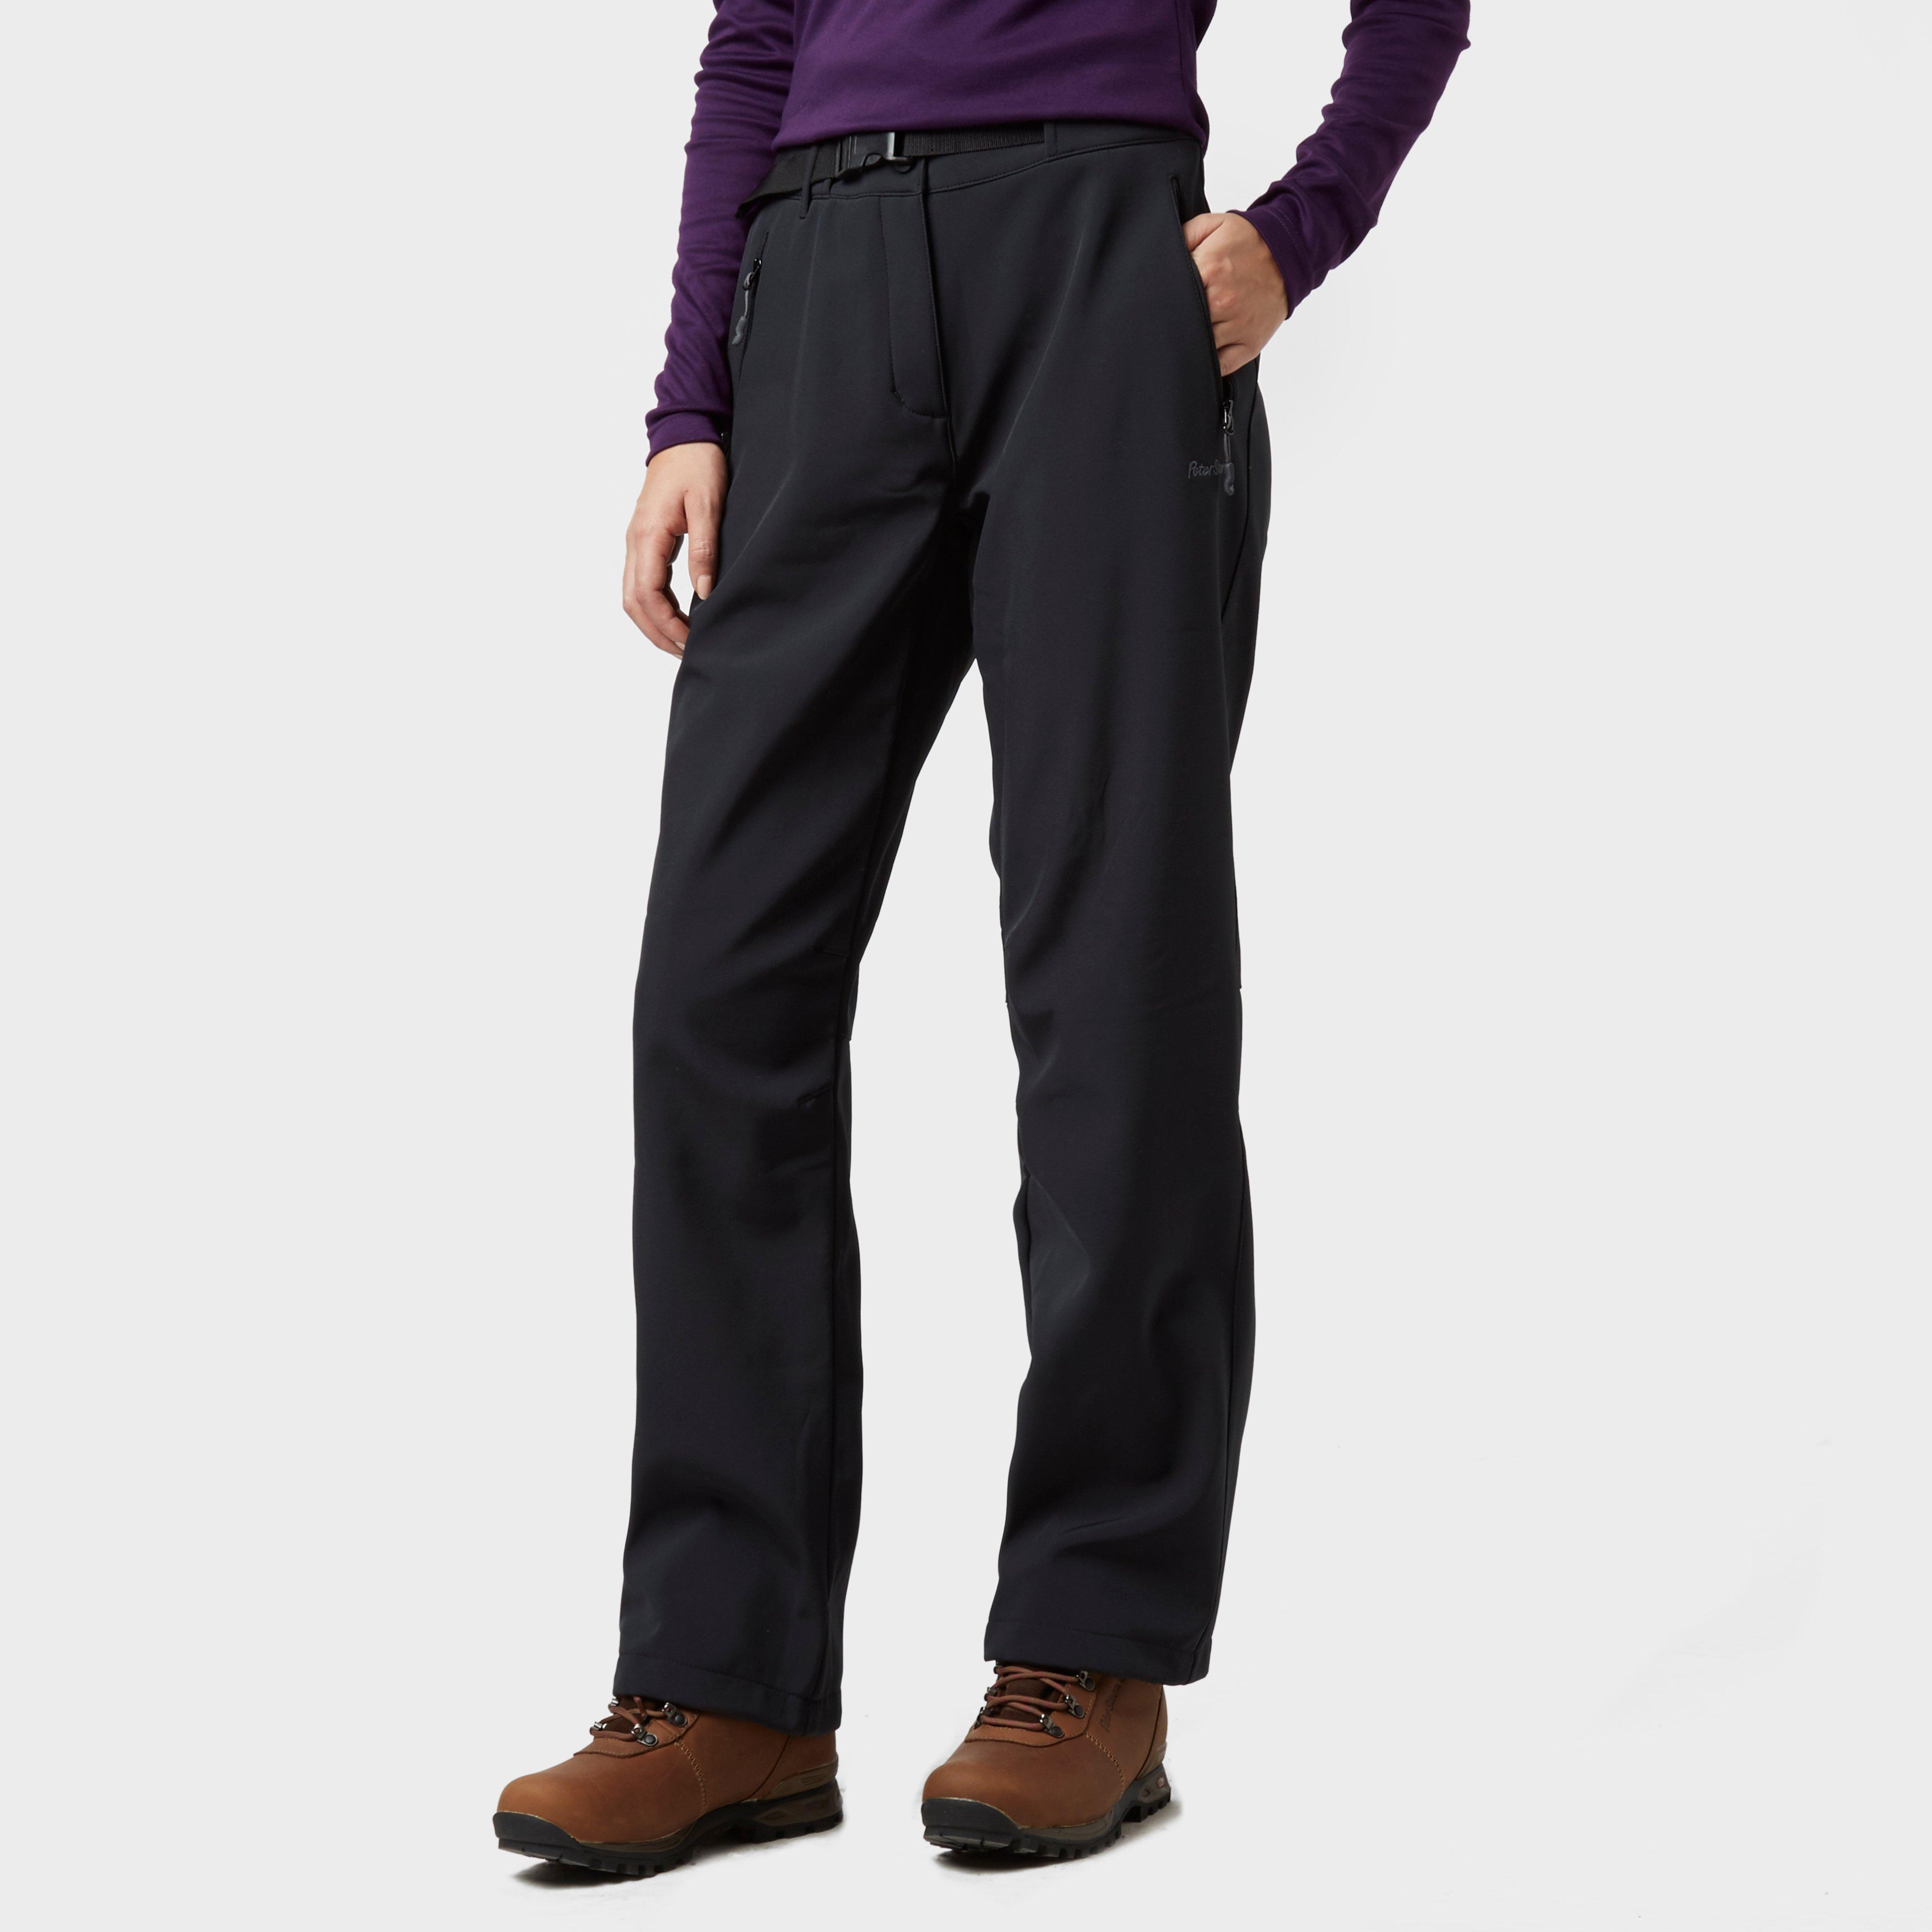 Peter Storm Peter Storm womens Softshell Trousers - Black, Black